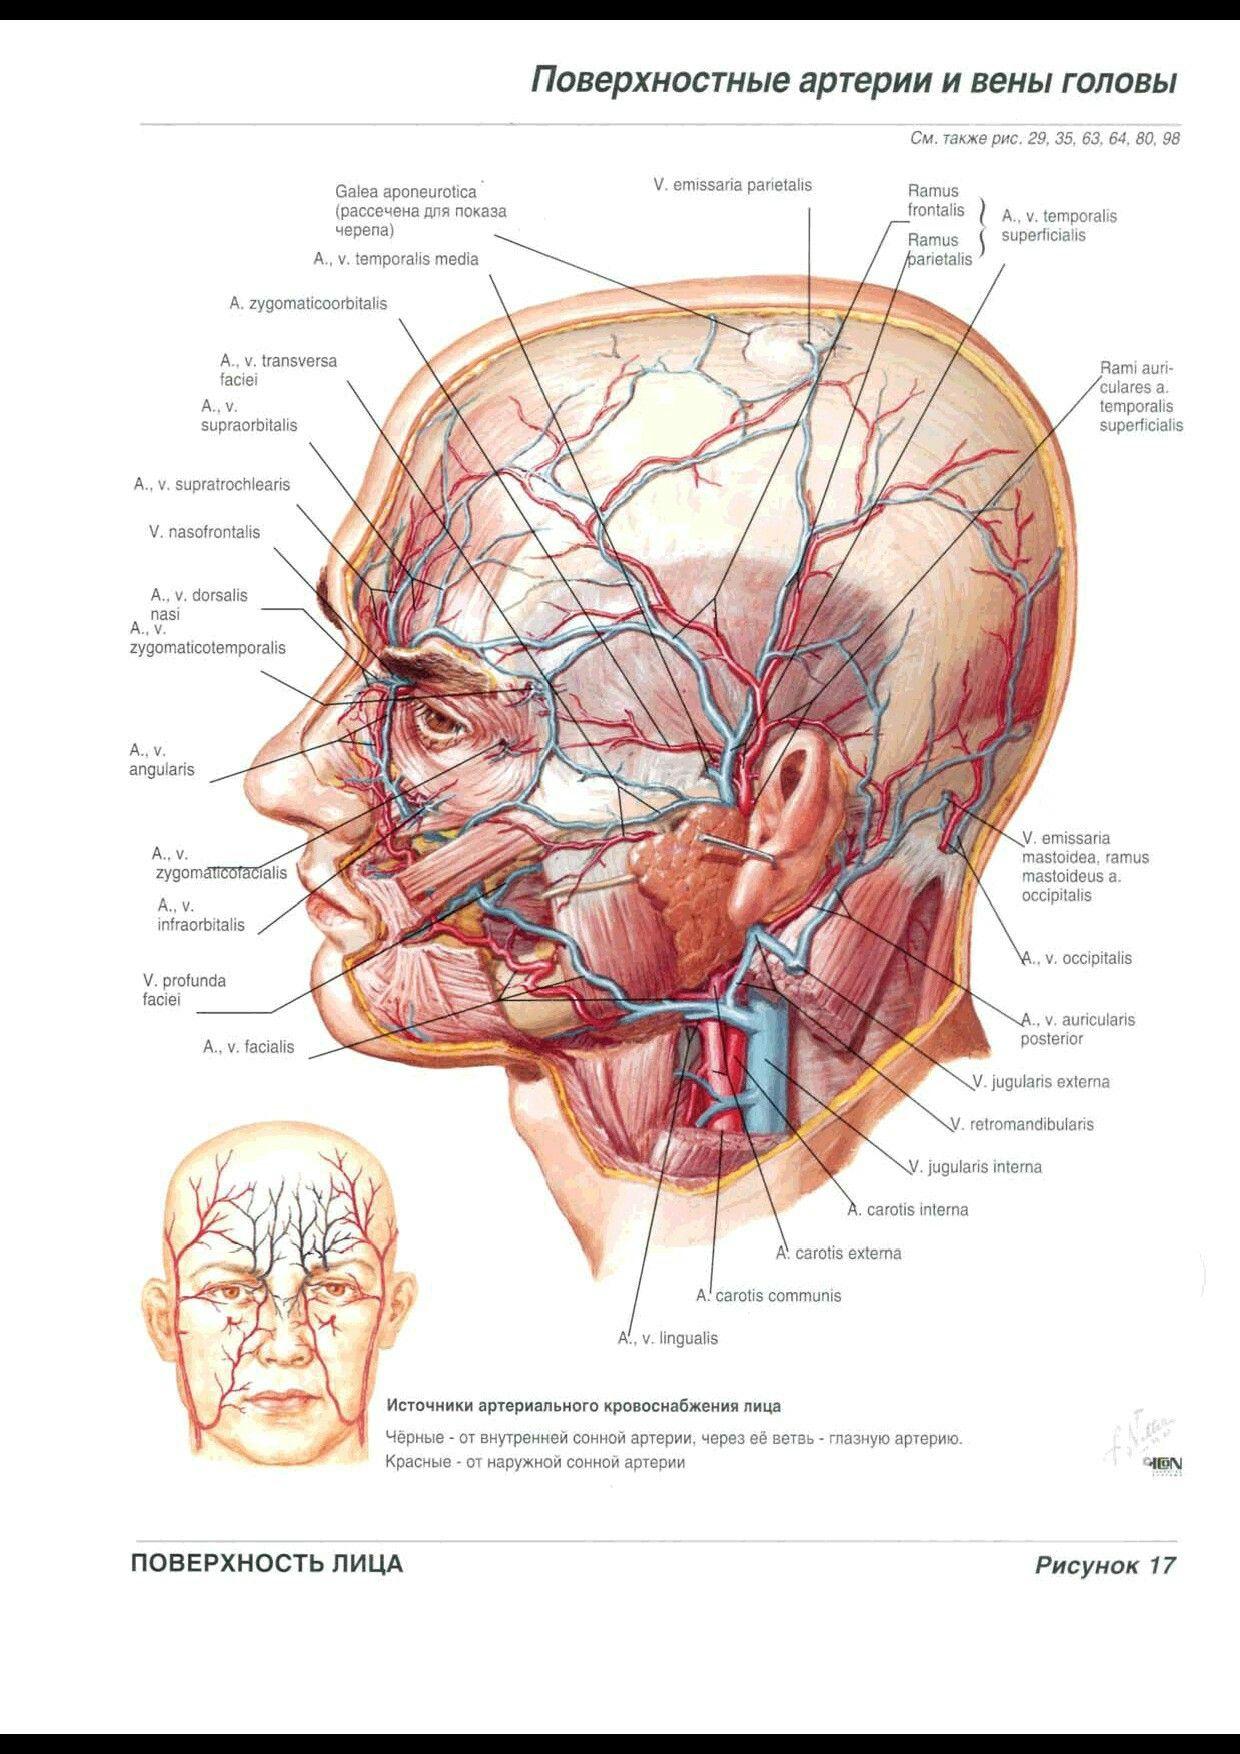 Pin By Alinash On Anatomy In 2018 Pinterest Anatomy Human Body